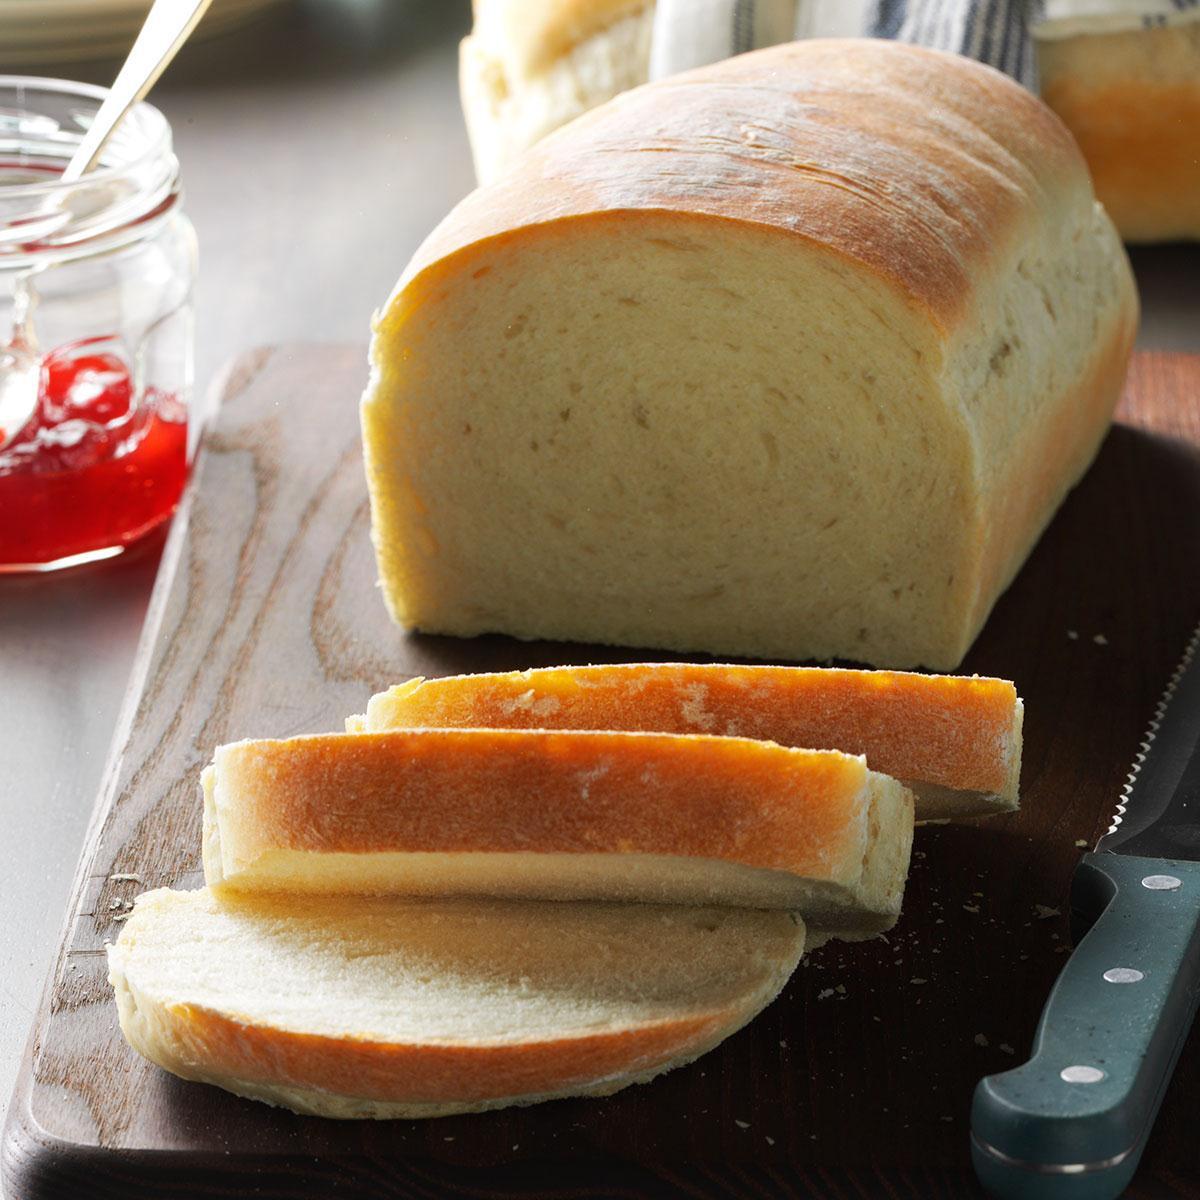 Homemade Bread Recipe  Basic Homemade Bread Recipe